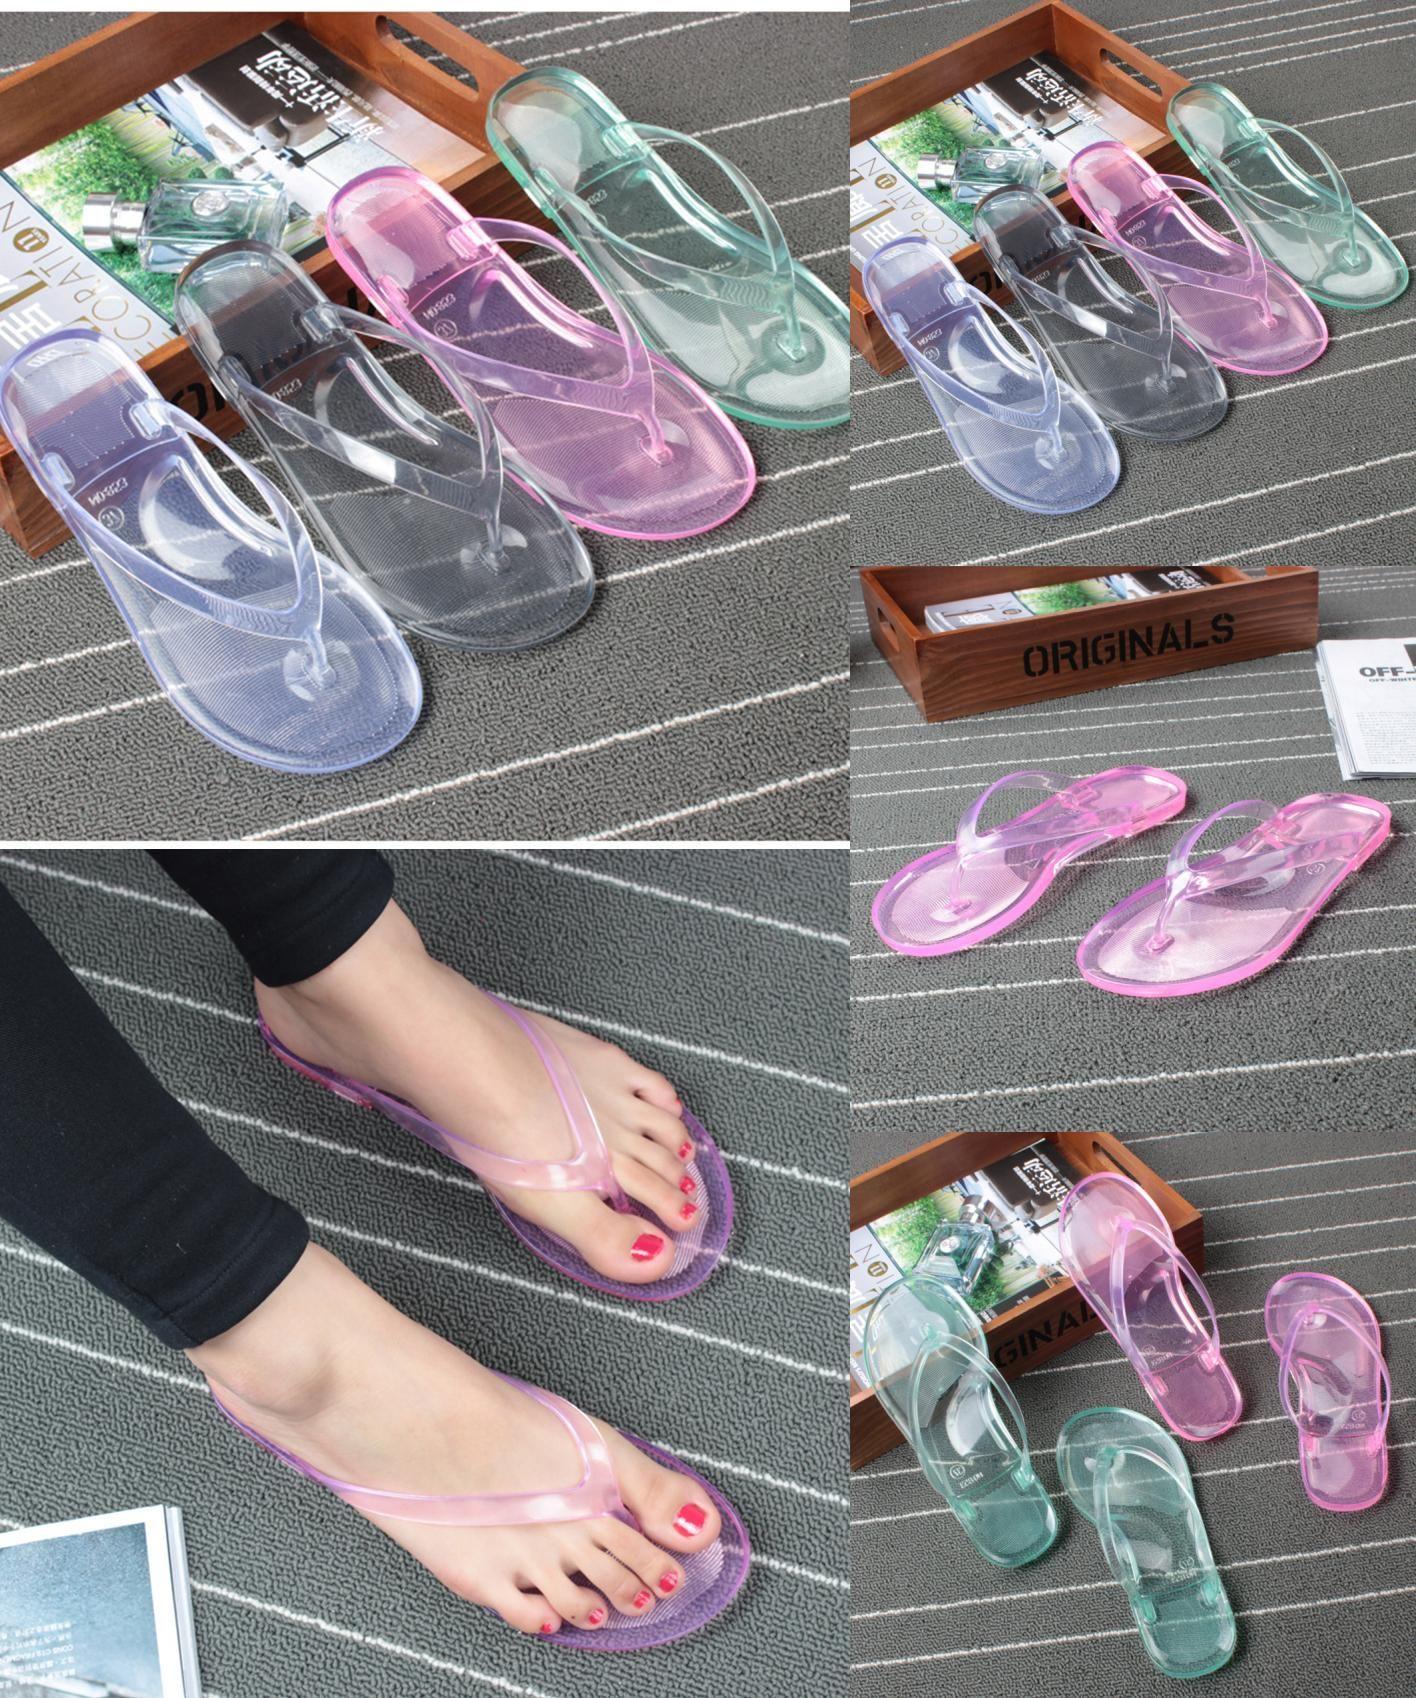 e3c1f95b7d21 [Visit to Buy] BIGTREE New Stylish Soft Summer Slippers Women Jelly  Transparent Crystal Bathroom Anti-slip Womens Shoes Flip Flops 4.8 TXJ  #Advertisement